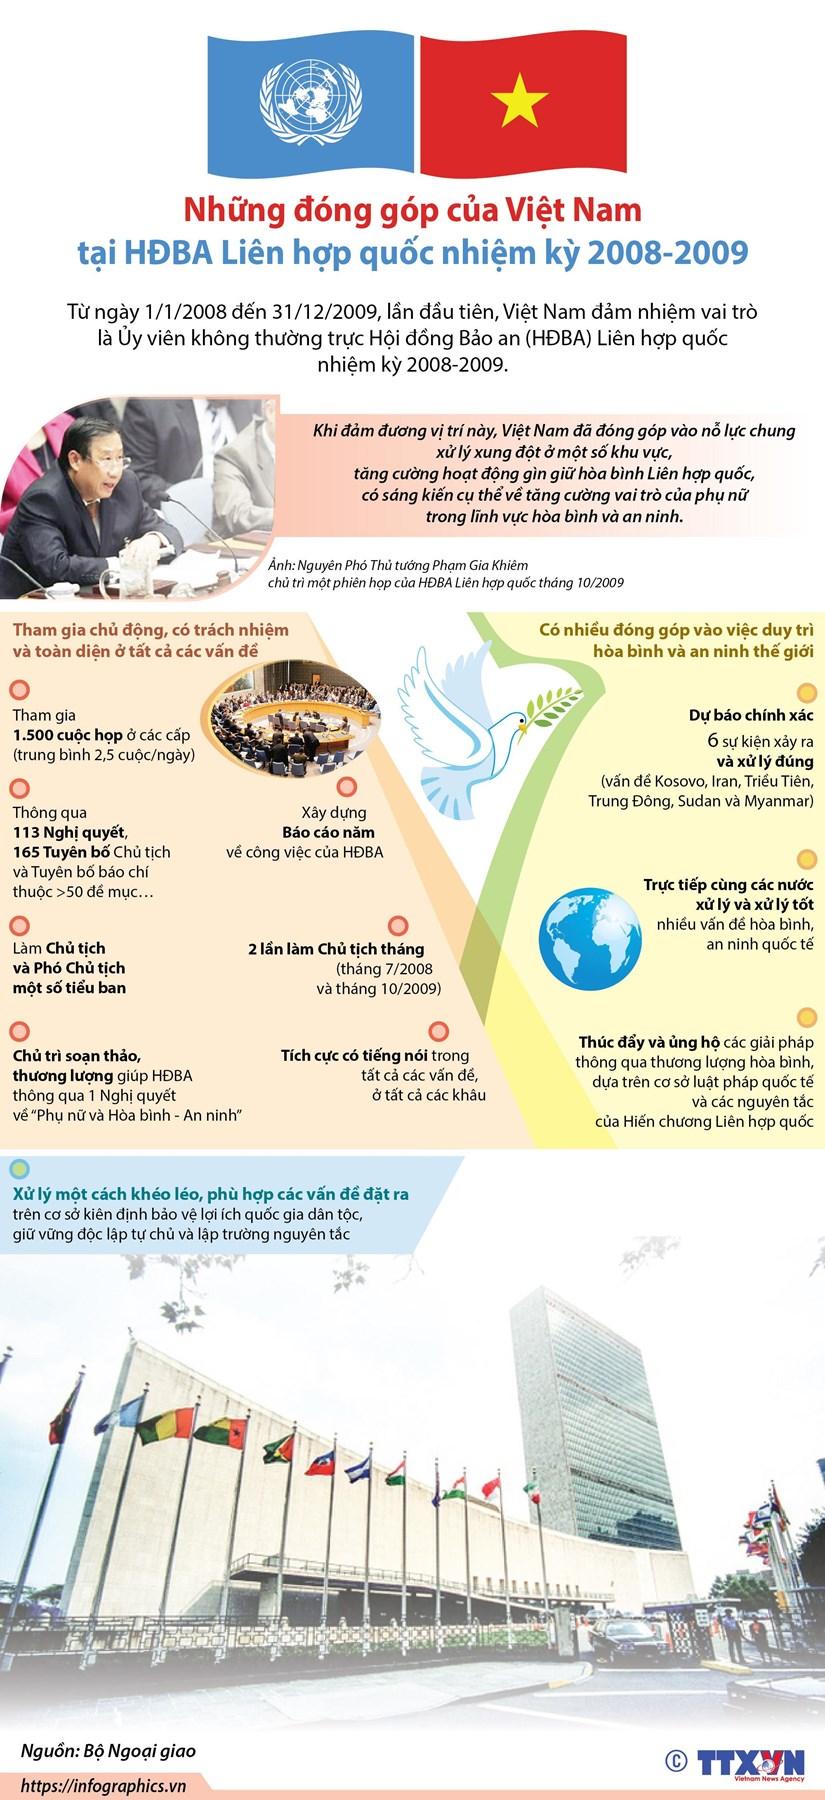 [Infographics] Nhung dong gop cua Viet Nam tai HDBA Lien hop quoc hinh anh 1